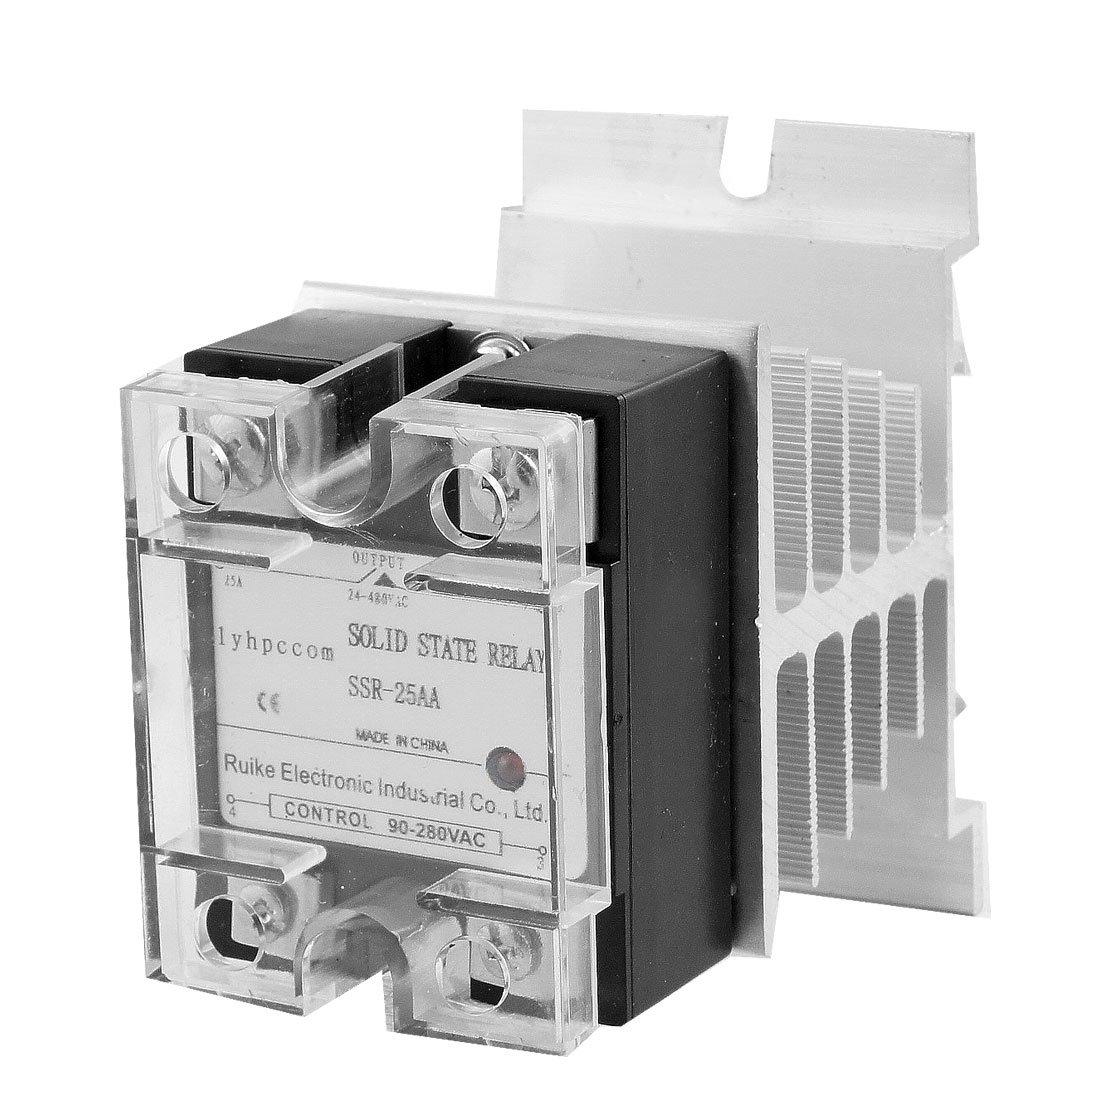 Uxcell 25a Ac Solid State Relay Ssr 90 280v To 24 480v Heat Hayward Goldline Aqualogic Main Printed Circuit Board Glxpcbmain Sink Amazoncom Industrial Scientific